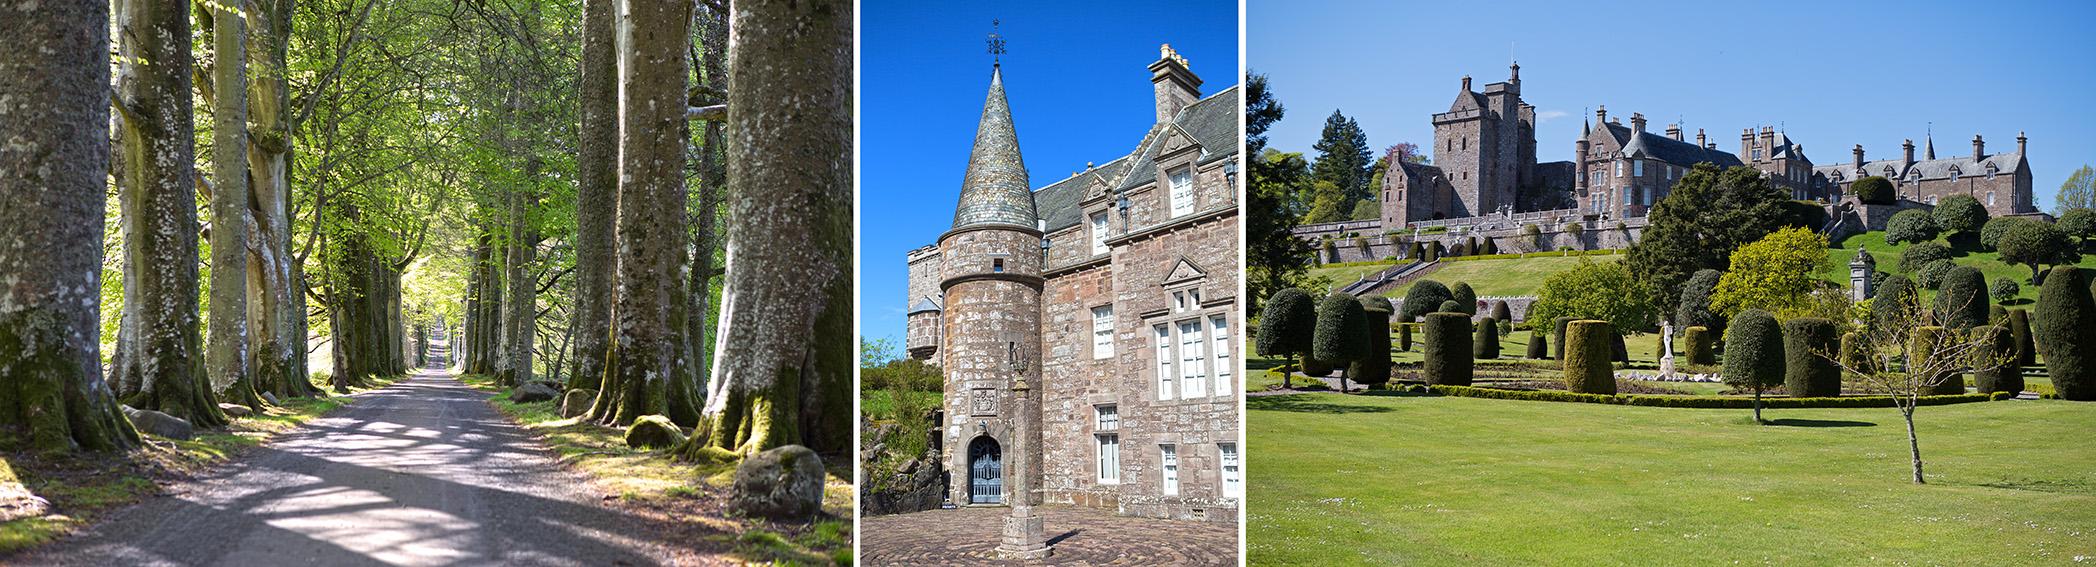 Drummond Castle, Perthshire Scotland